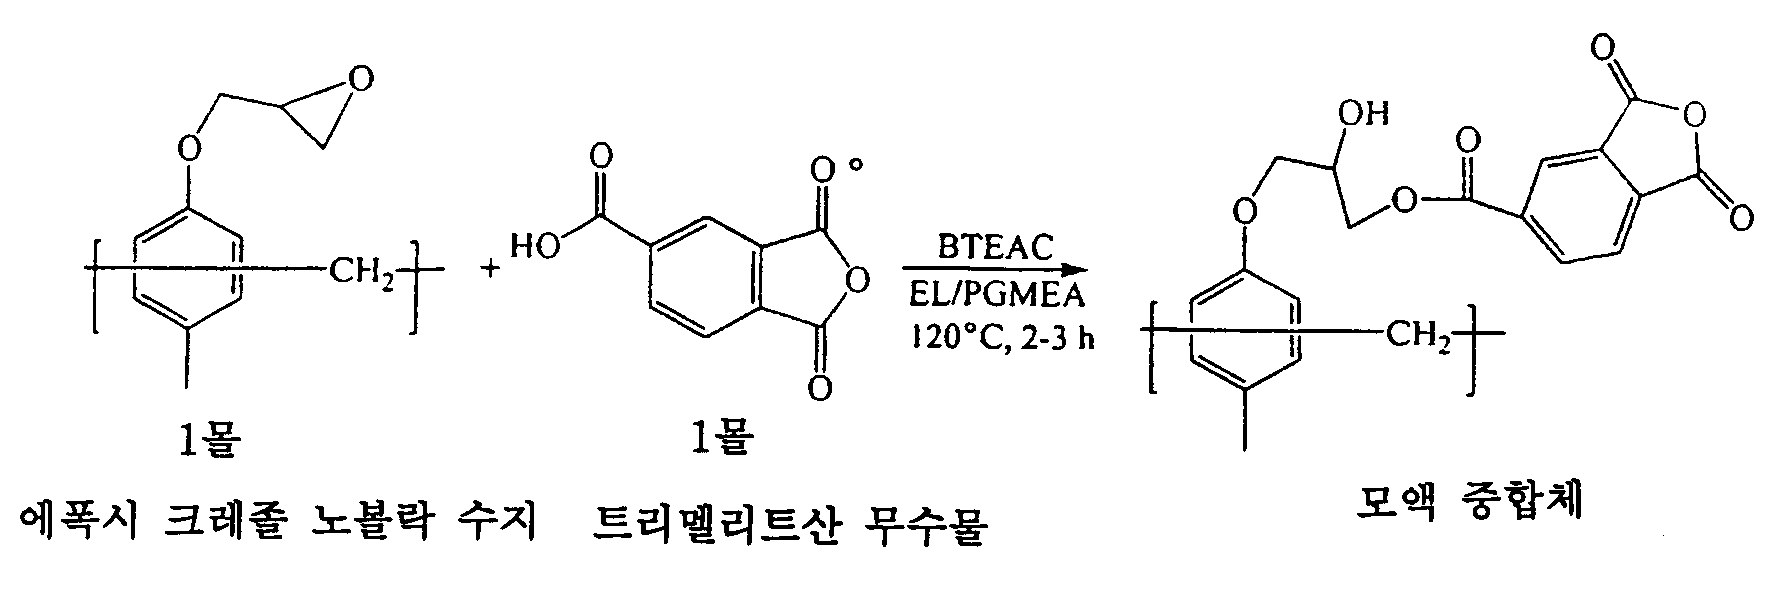 Figure 112004034300750-pct00006